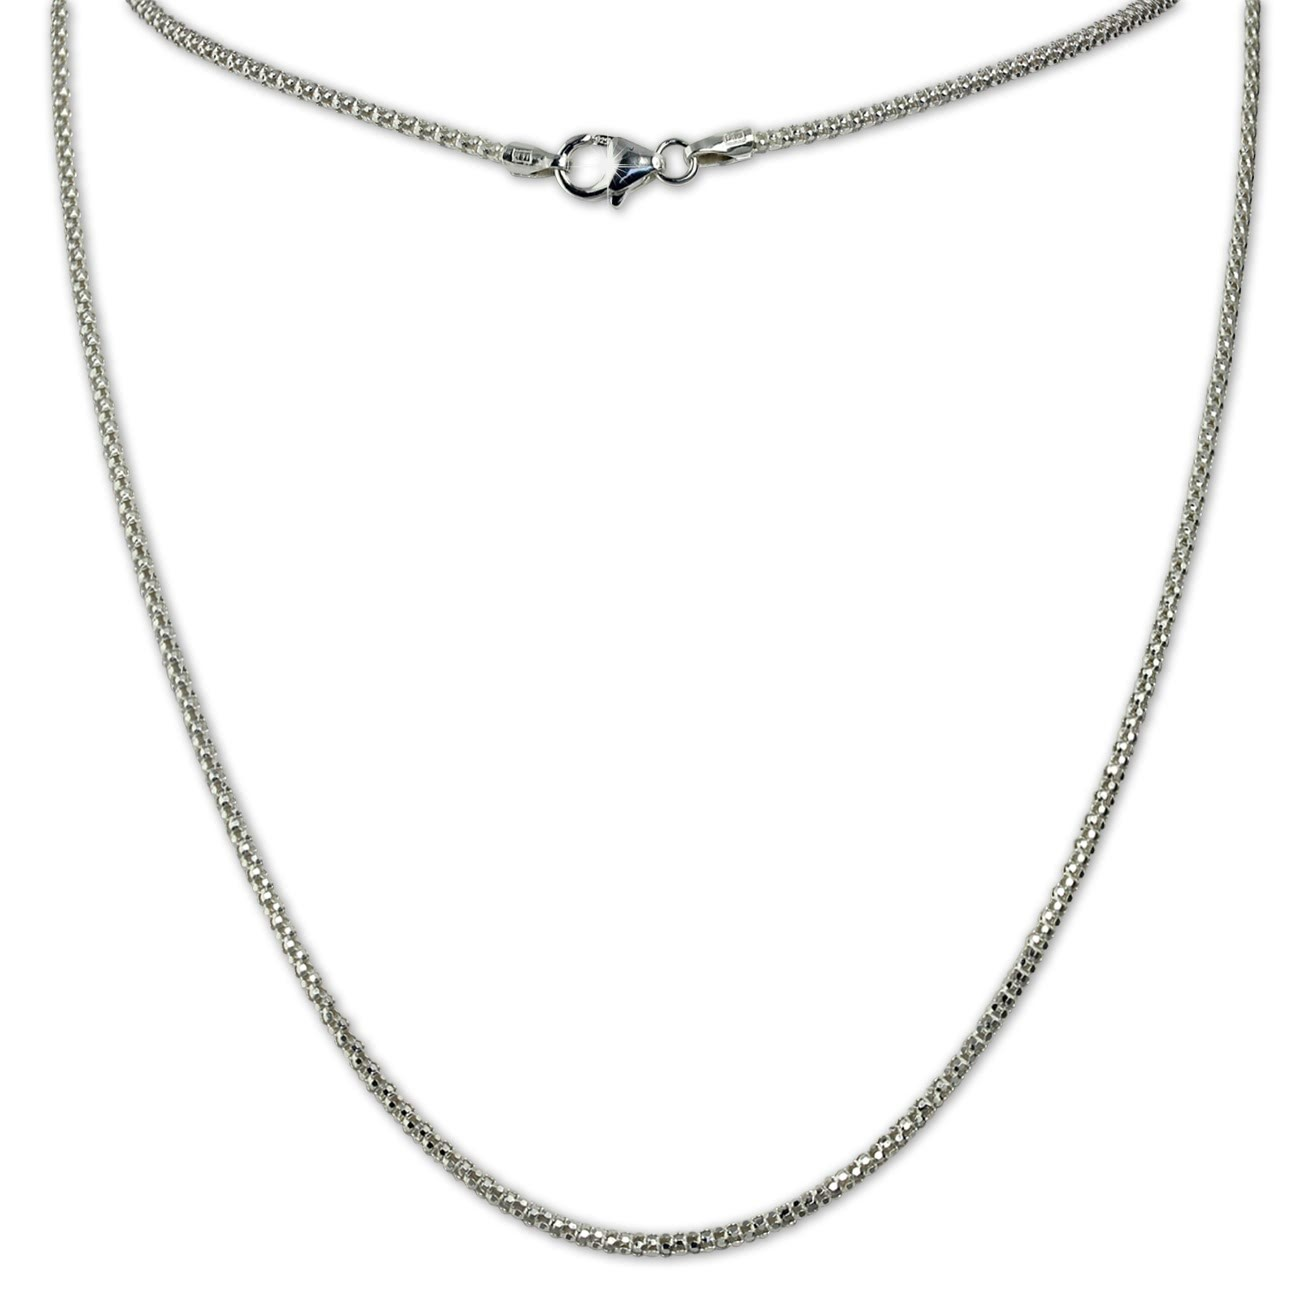 SilberDream Collier Himbeerkette 925er Silber Halskette 45cm Kette SDK22745J